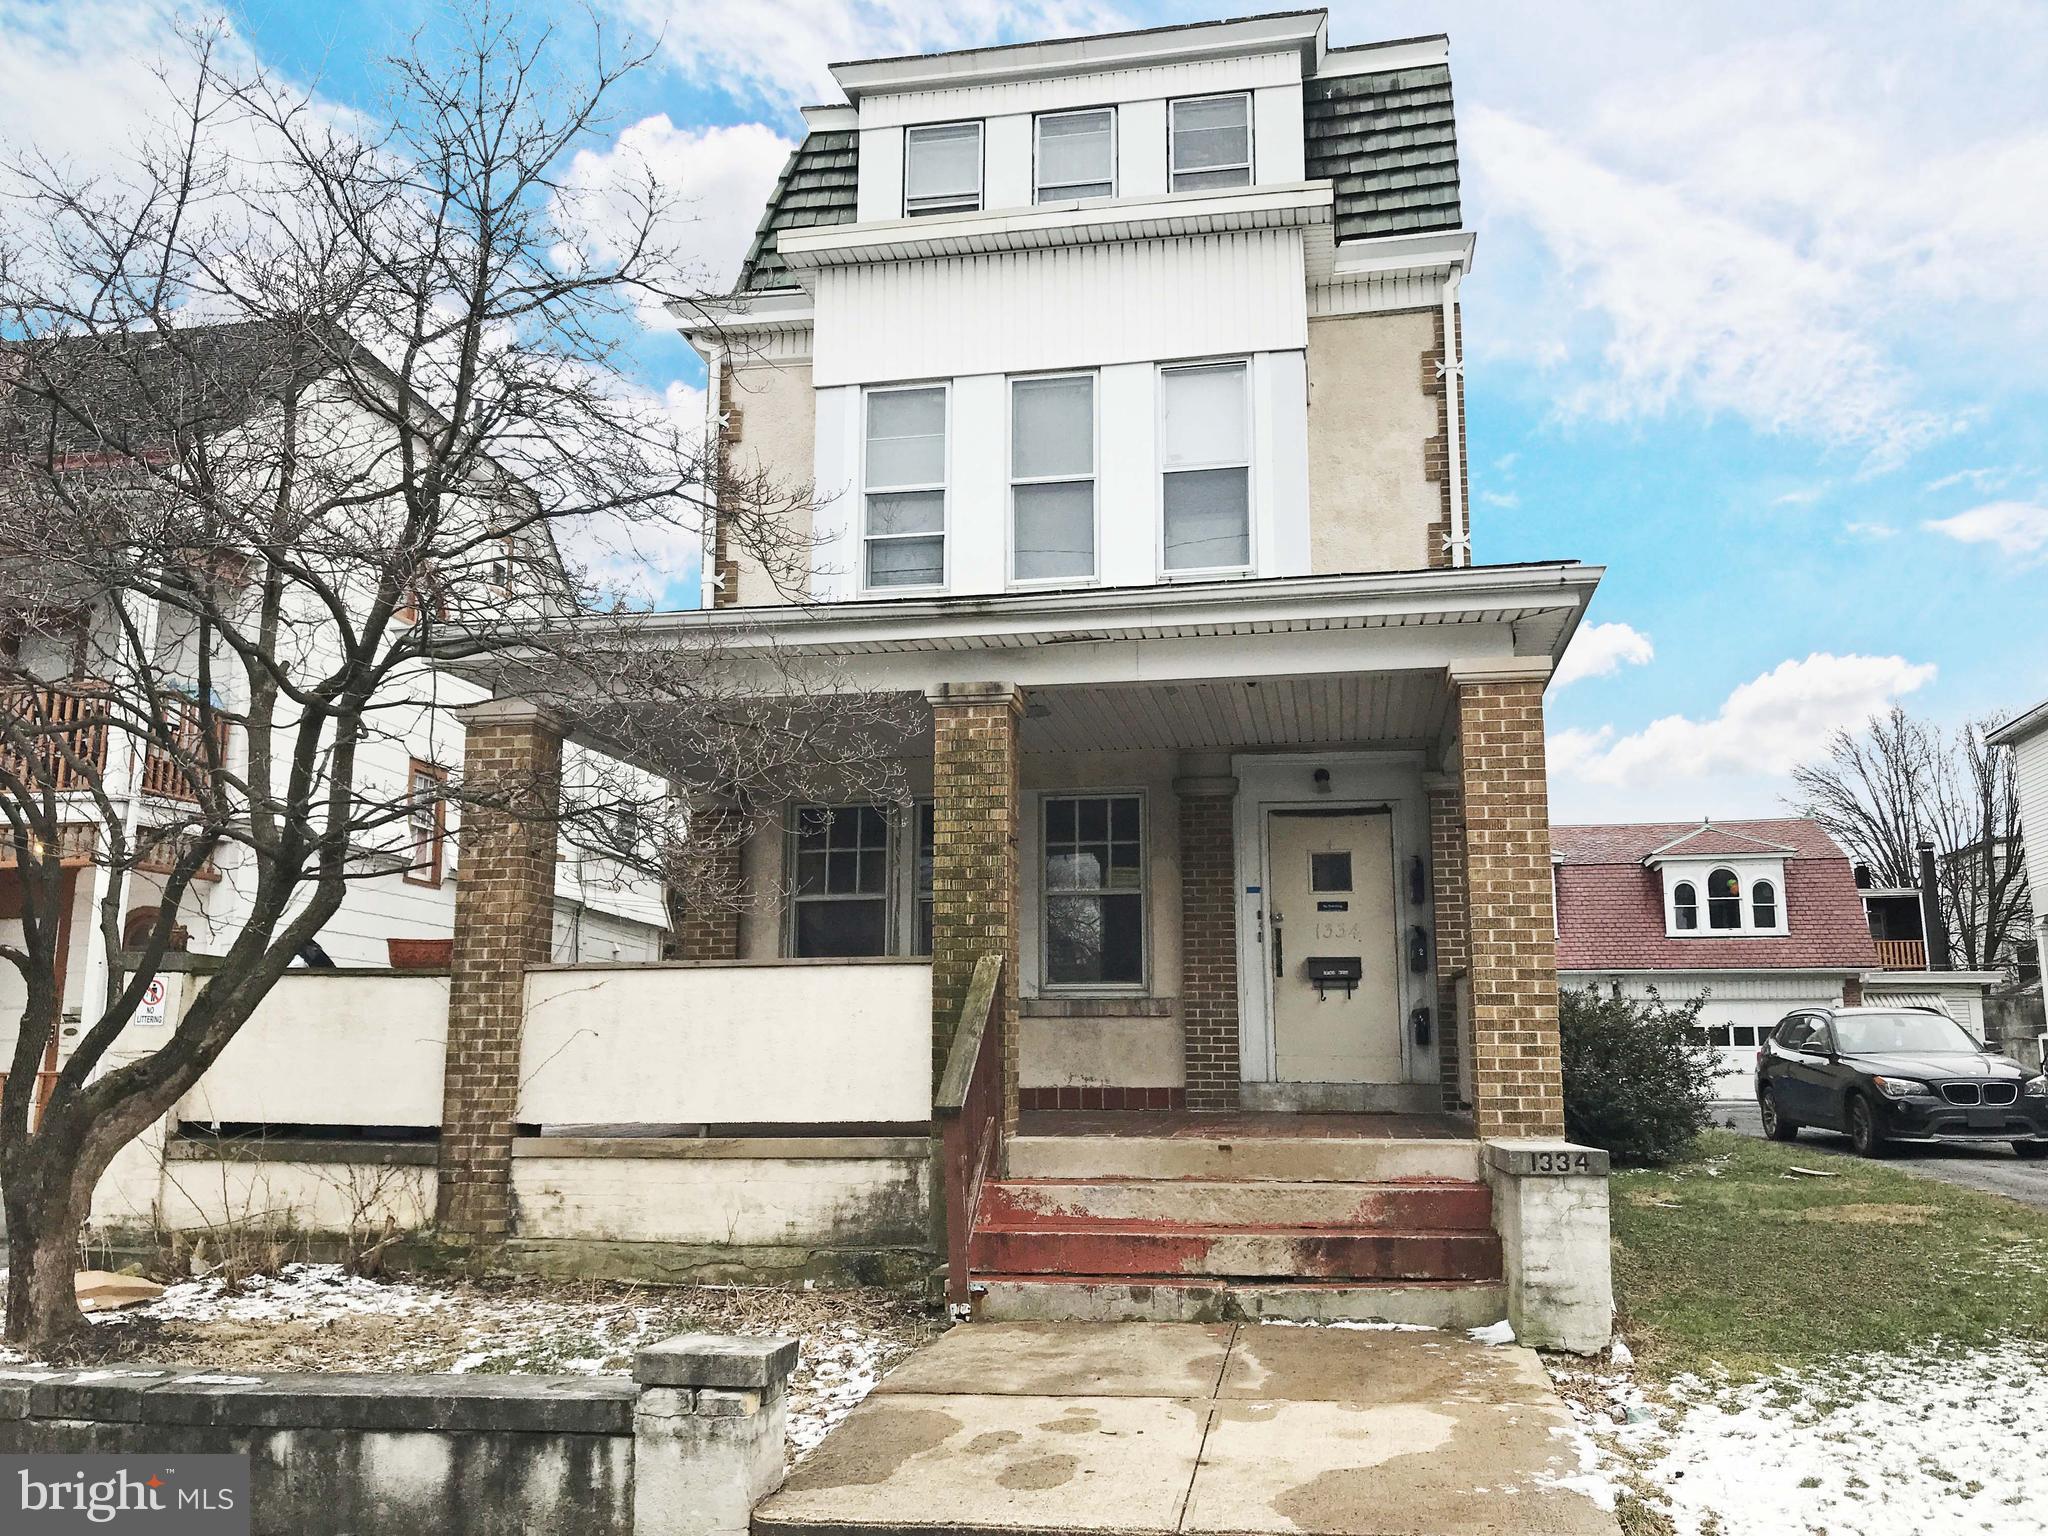 1334 LINDEN STREET, ALLENTOWN, PA 18102